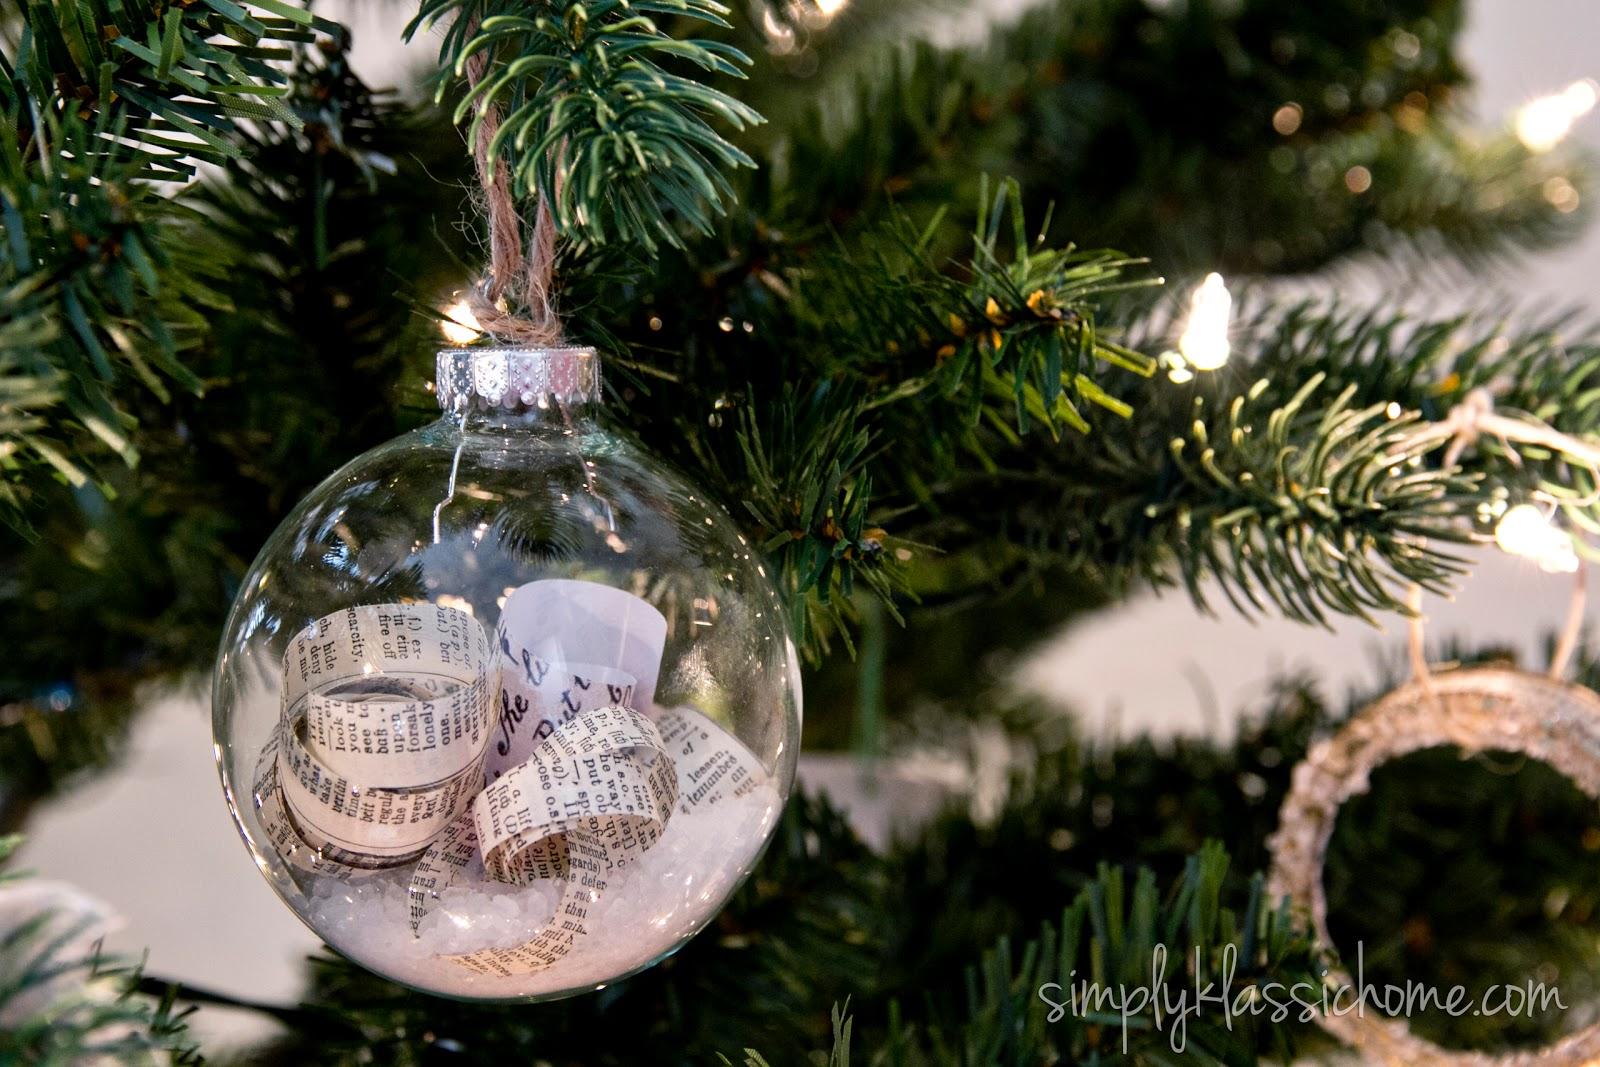 Christmas Ornaments Glass Balls Handmade : Ten handmade ornaments in under an hour